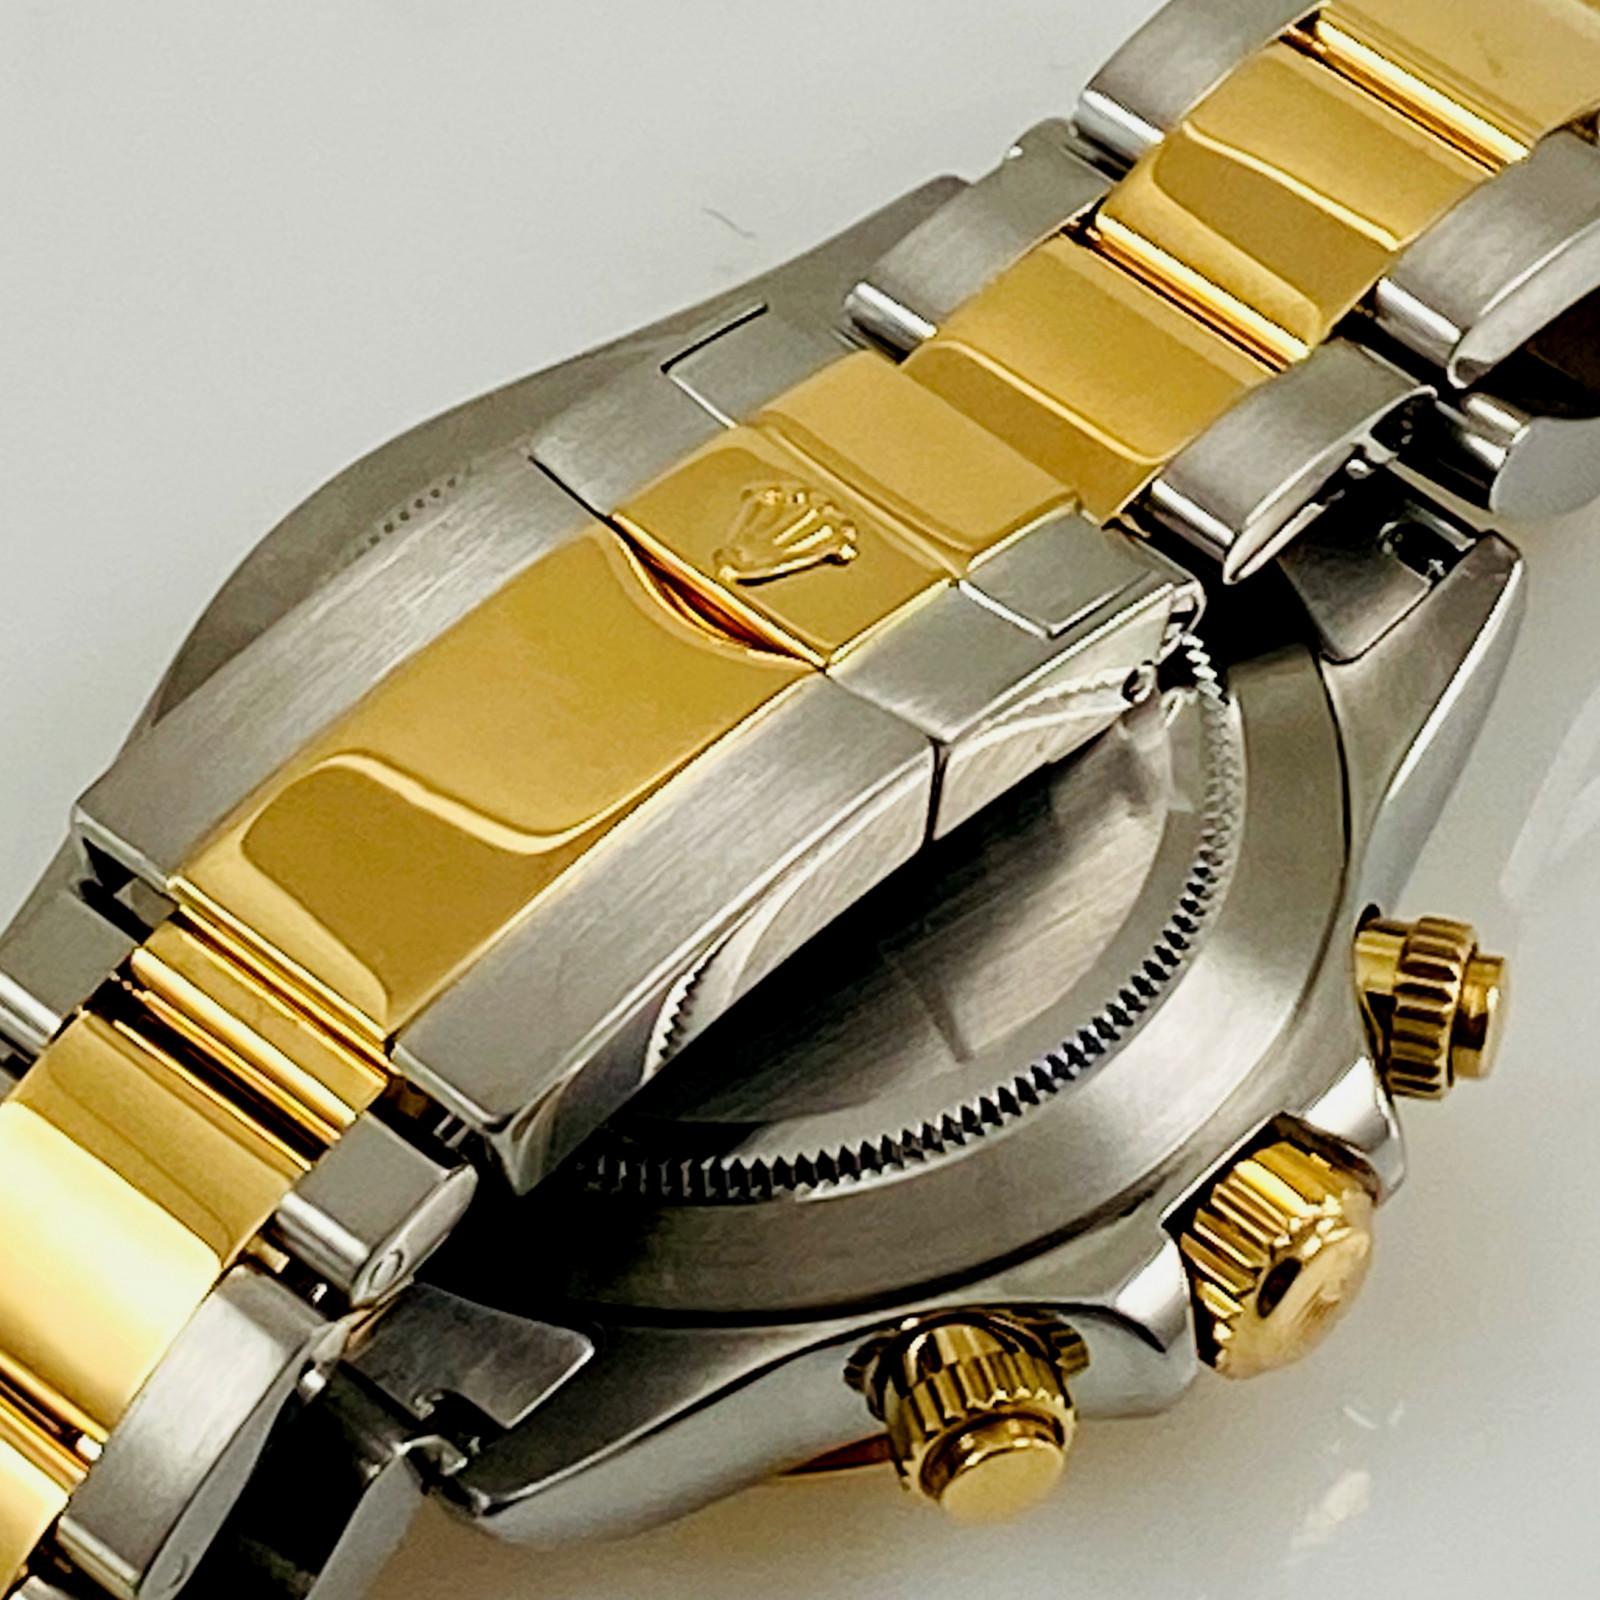 Rolex Daytona 116523 Excellent Condition Full Set